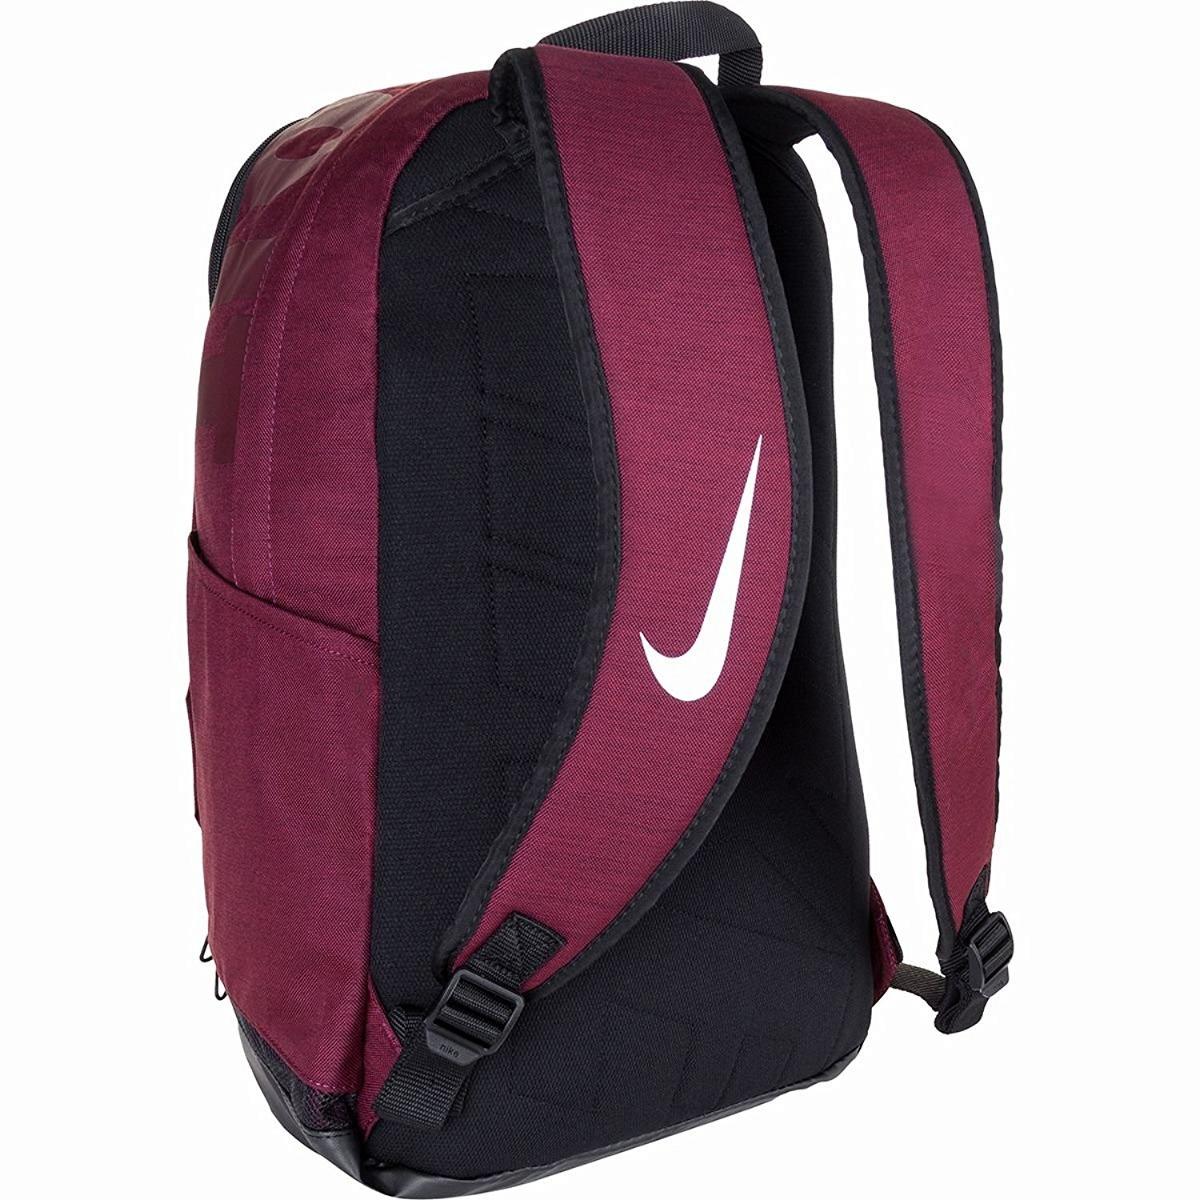 Mochila De Entrenamiento Nike Brasilia (extragrande) -   373.777 en ... 49c18daca260e